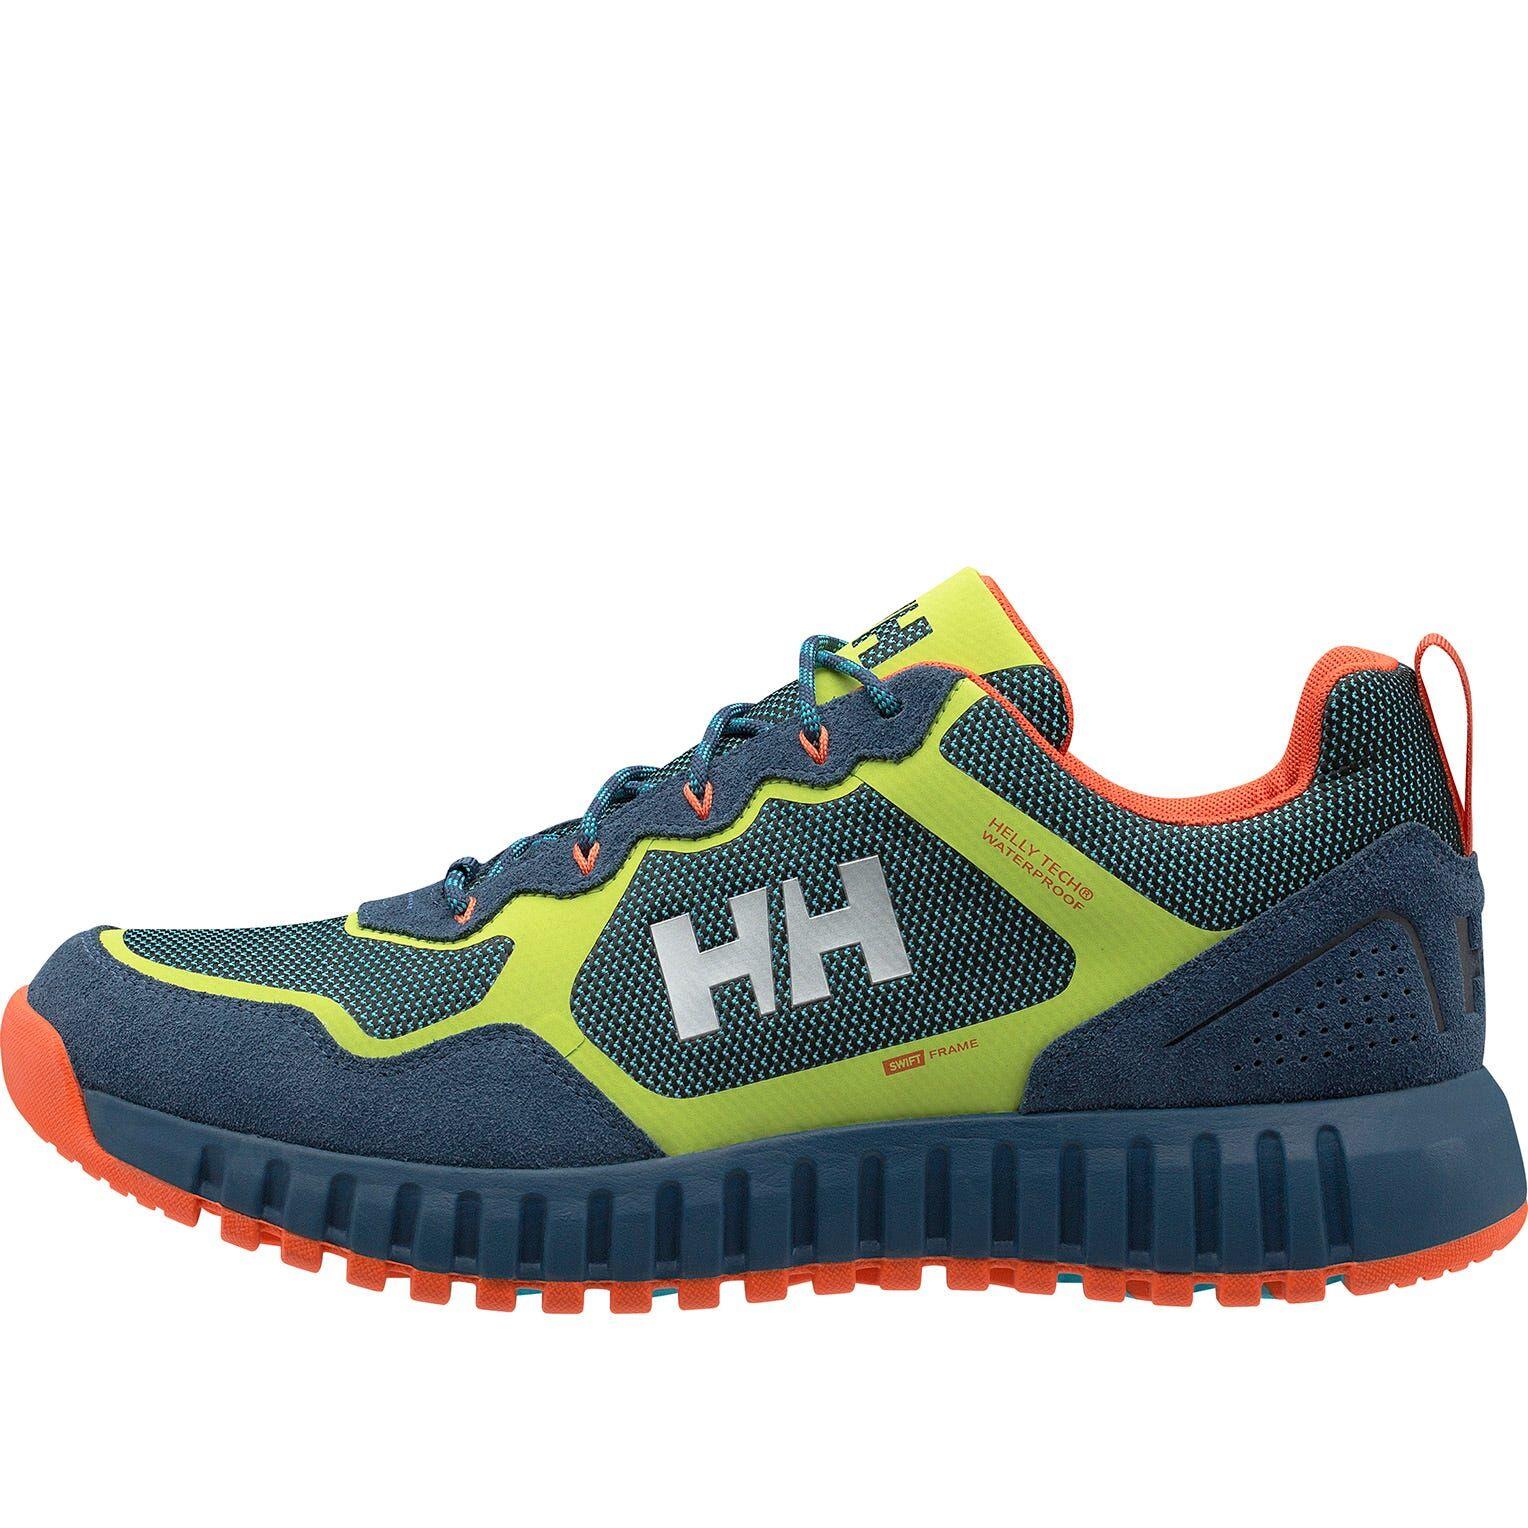 Helly Hansen Monashee Ullr Low Ht Hiking Boot Yellow 44.5/10.5